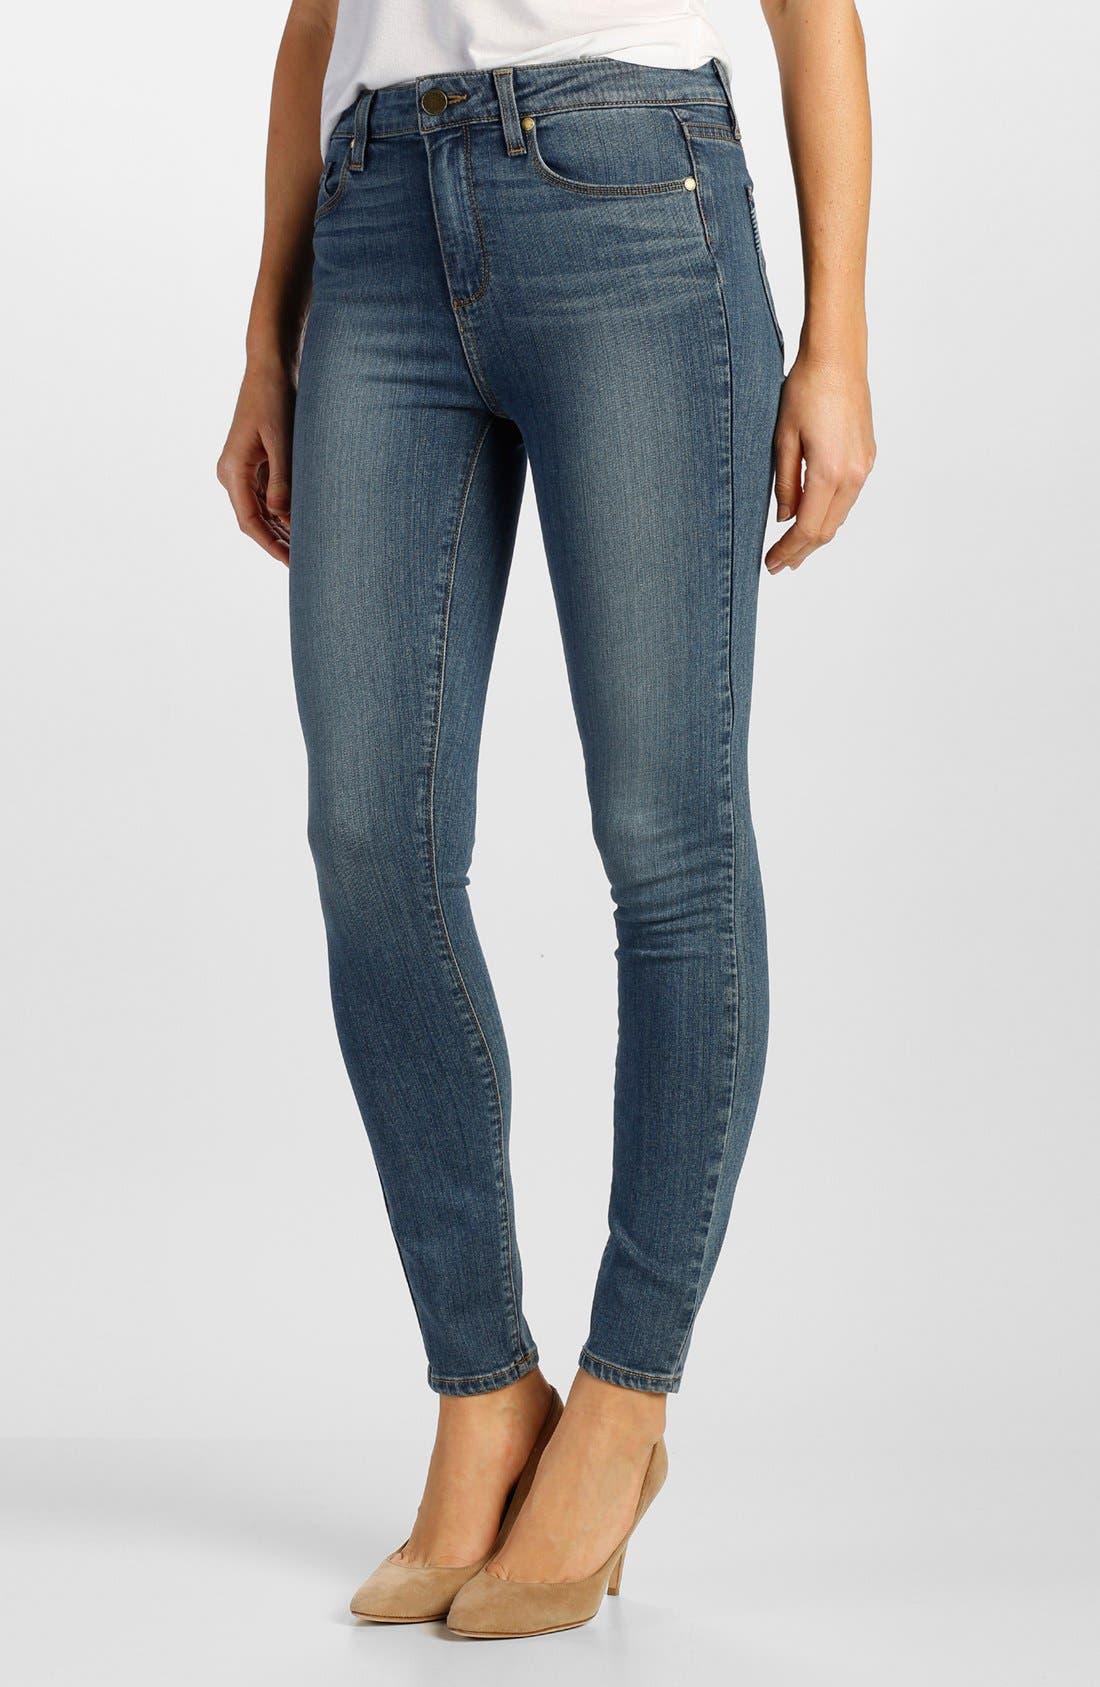 Main Image - Paige Denim 'Transcend - Hoxton' High Rise Ankle Skinny Jeans (Brett)